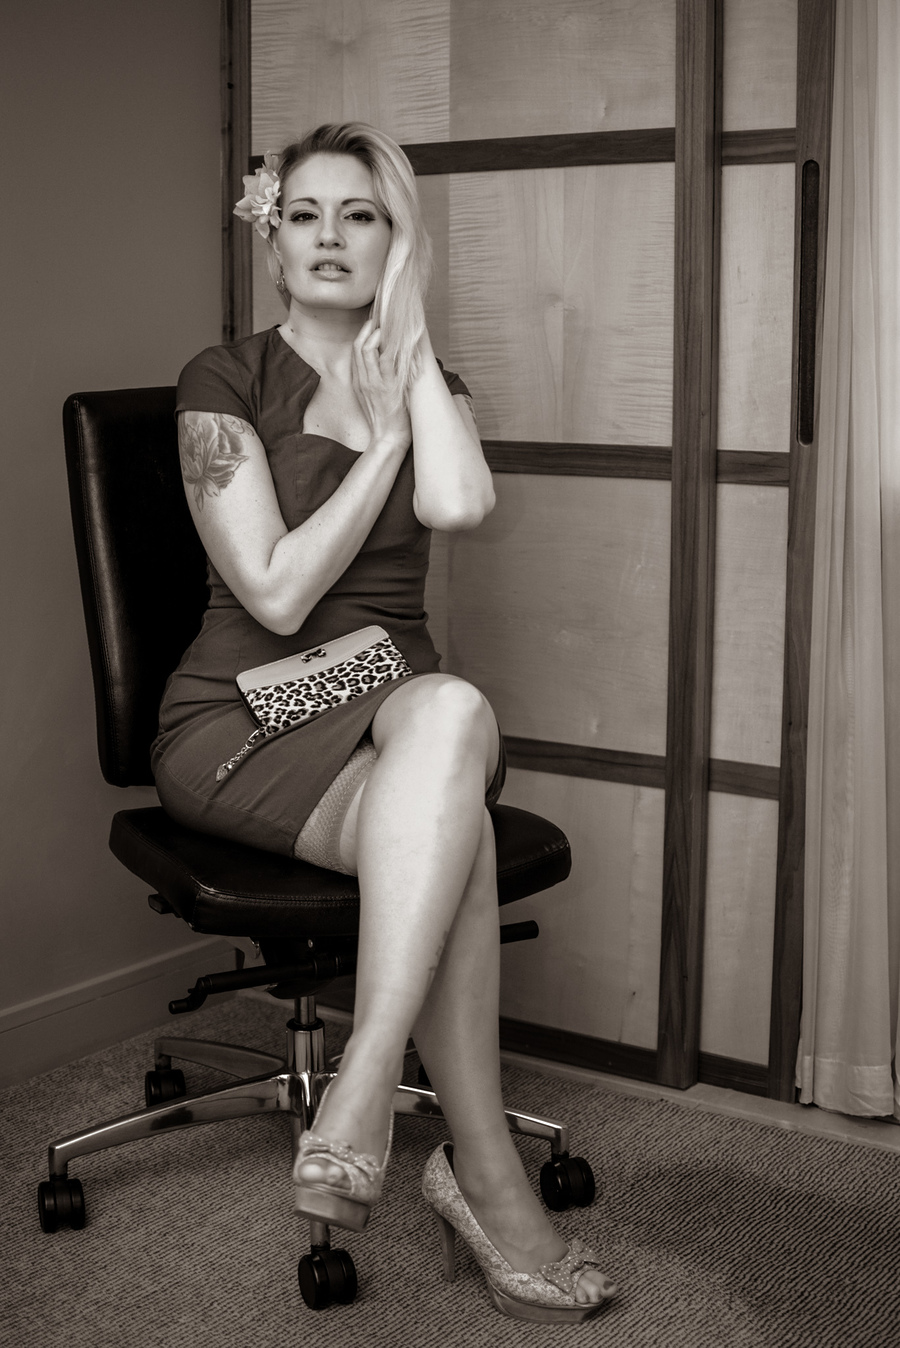 Rendezvou... / Photography by Ajfx87, Model Melanie Bond (Butler), Makeup by Melanie Bond (Butler), Post processing by Ajfx87, Stylist Melanie Bond (Butler), Hair styling by Melanie Bond (Butler) / Uploaded 27th February 2020 @ 05:49 PM